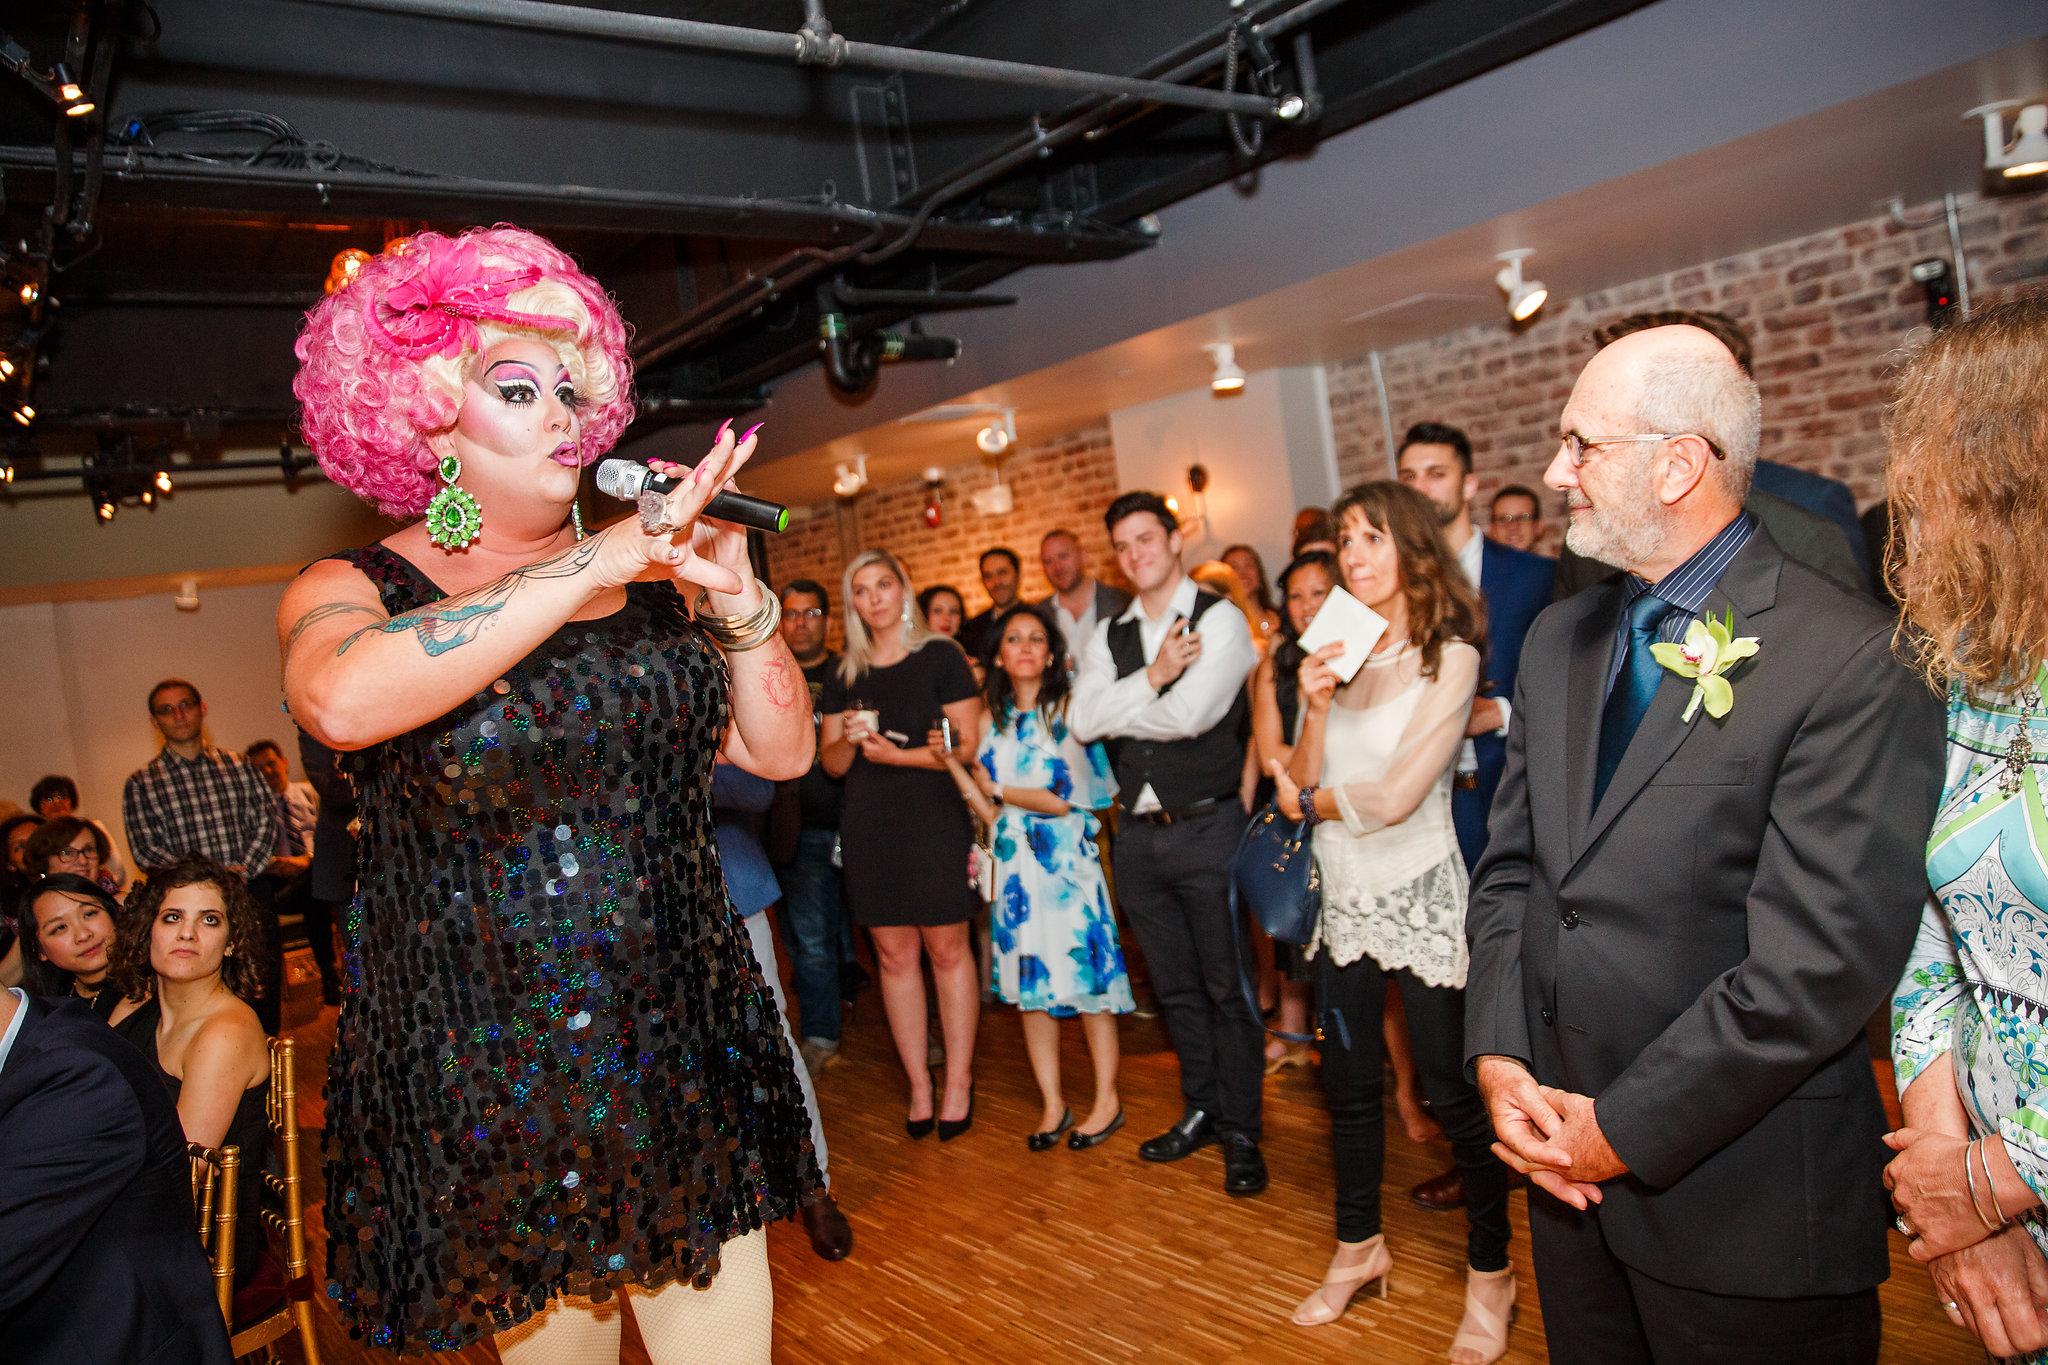 Mama-tits-drag-queen-washington-dc-wedding